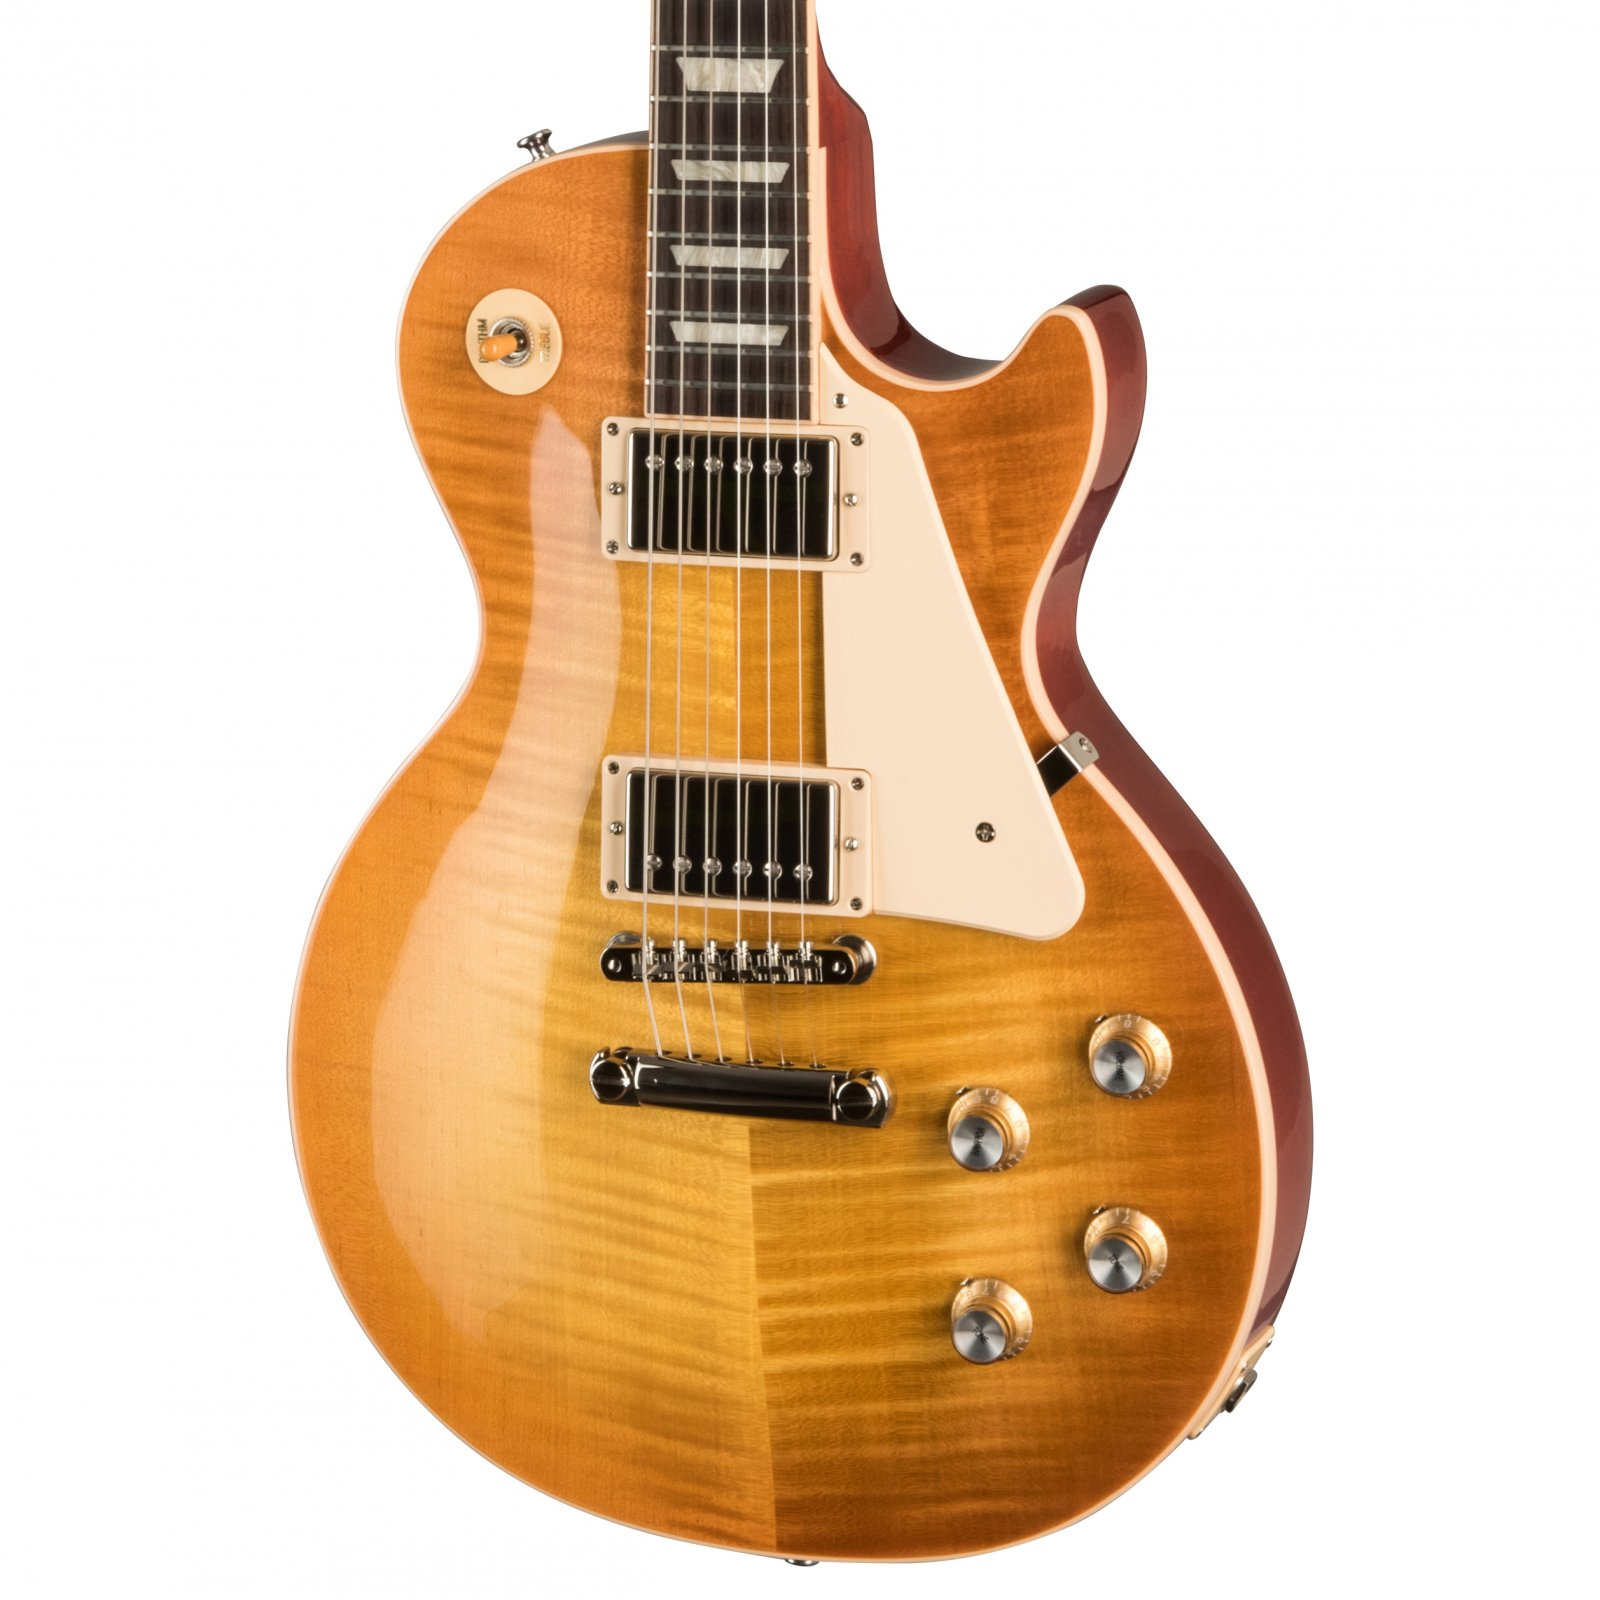 Gibson Les Paul Standard '60s Figured Top - Unburst